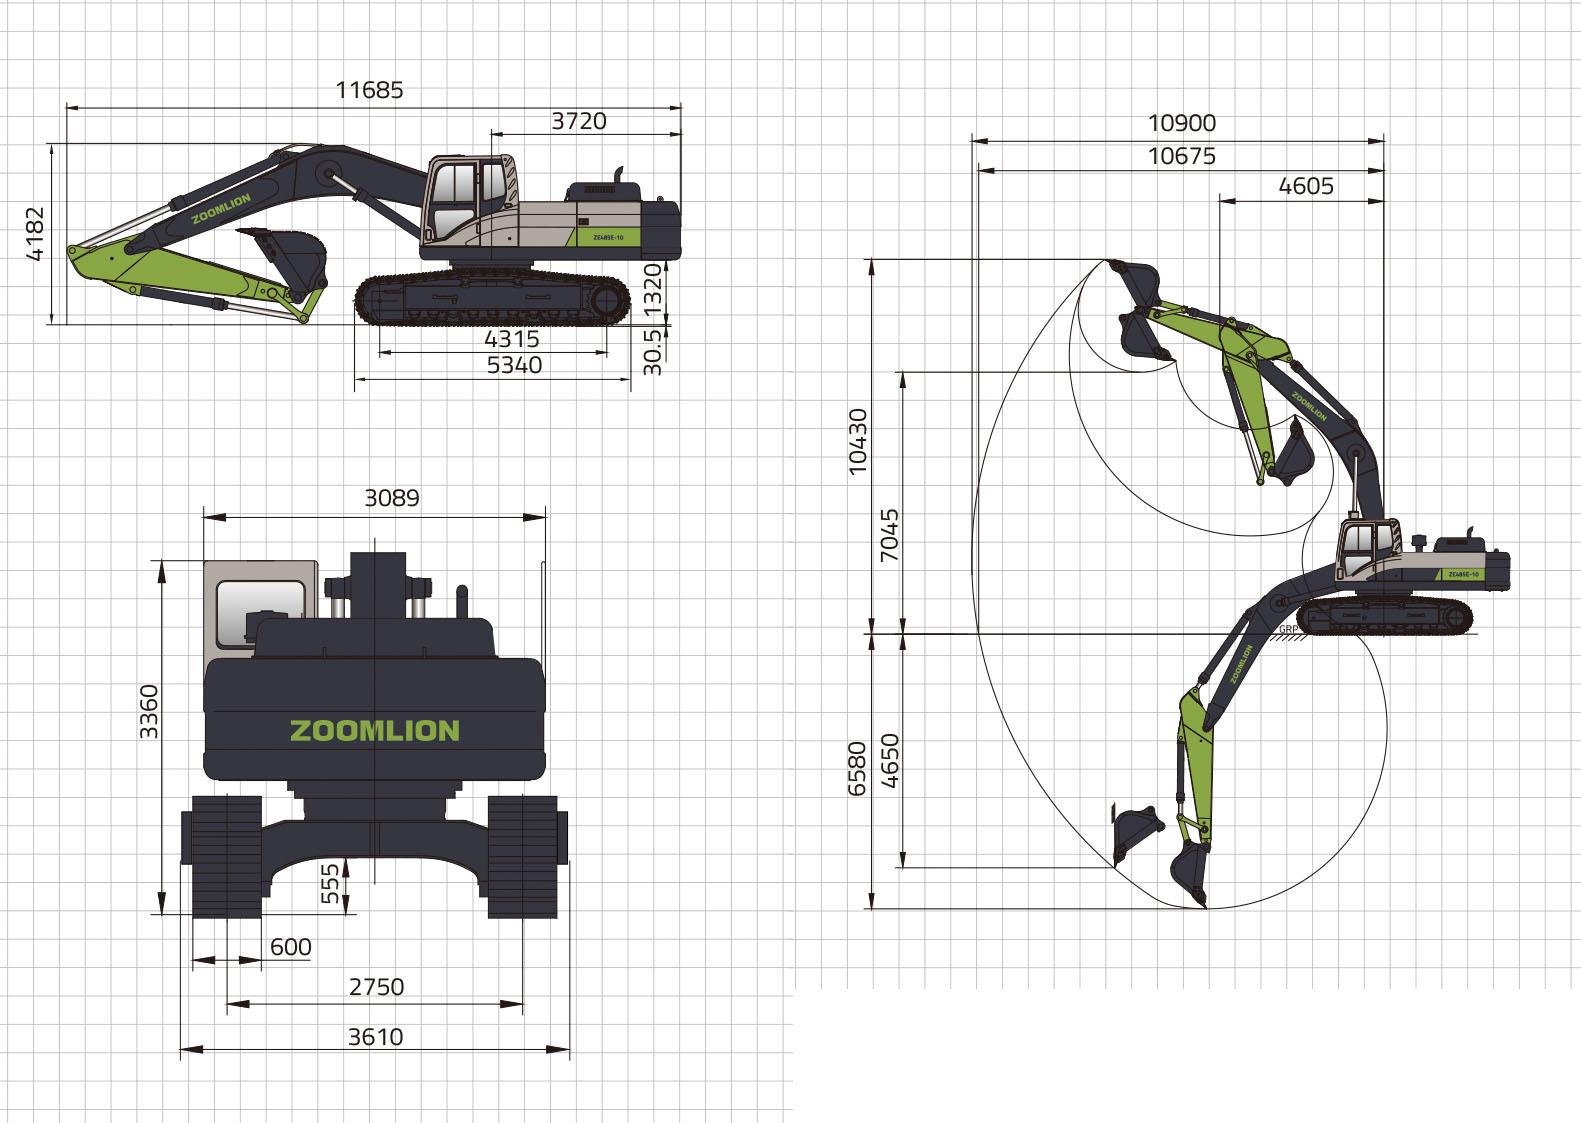 Размеры экскаватора ZE485E-10 Zoomlion